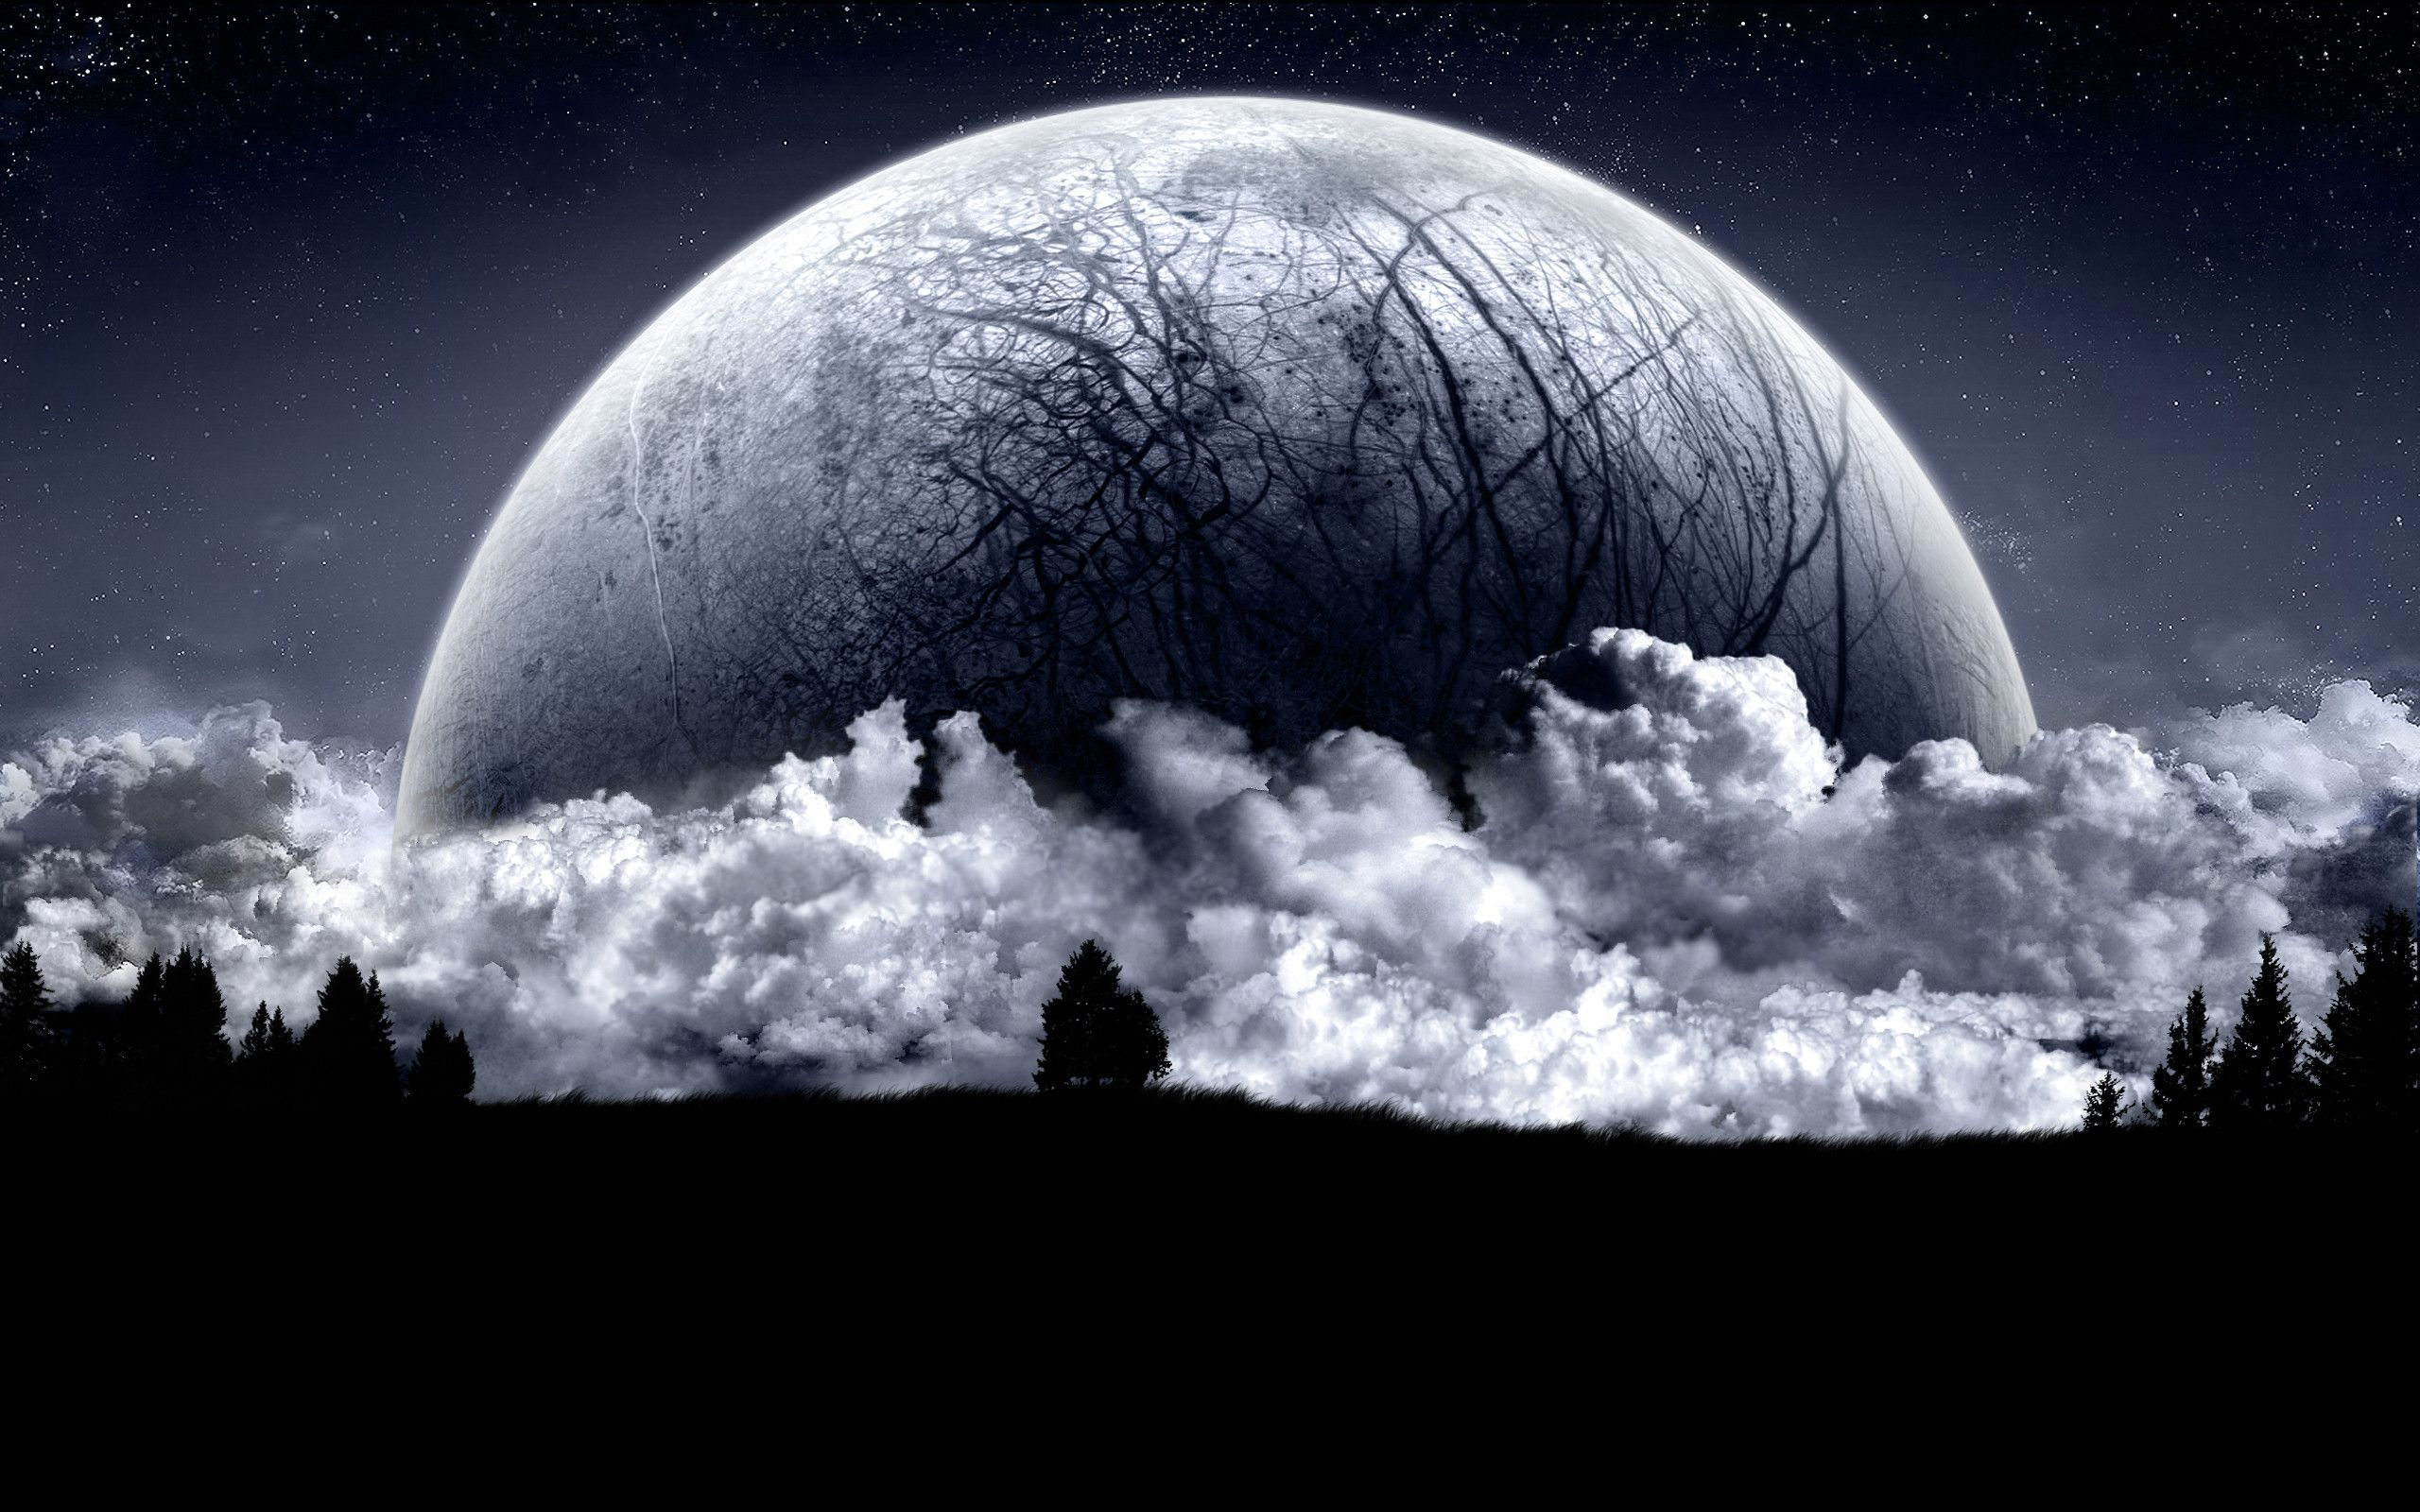 Dark Moon Wallpapers Top Free Dark Moon Backgrounds Wallpaperaccess